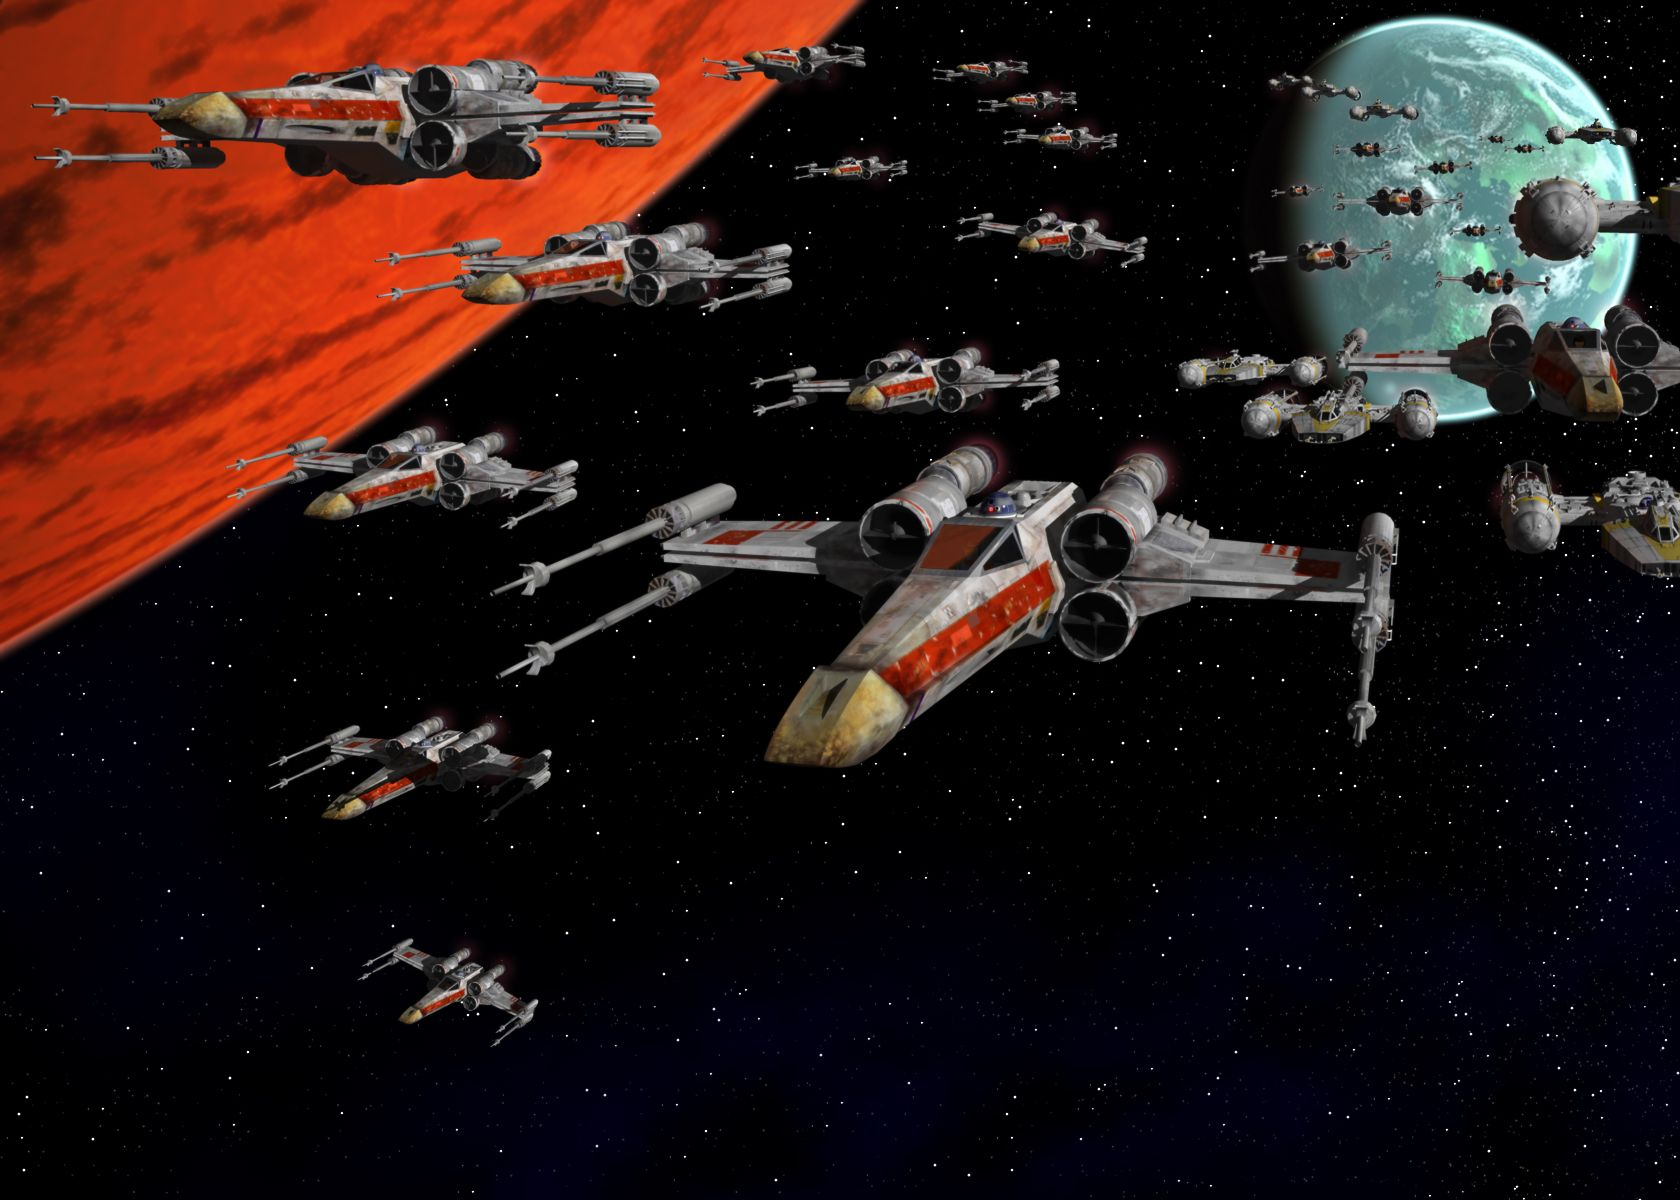 Pc Hi Res Star Wars Wallpapers Alexander Betho